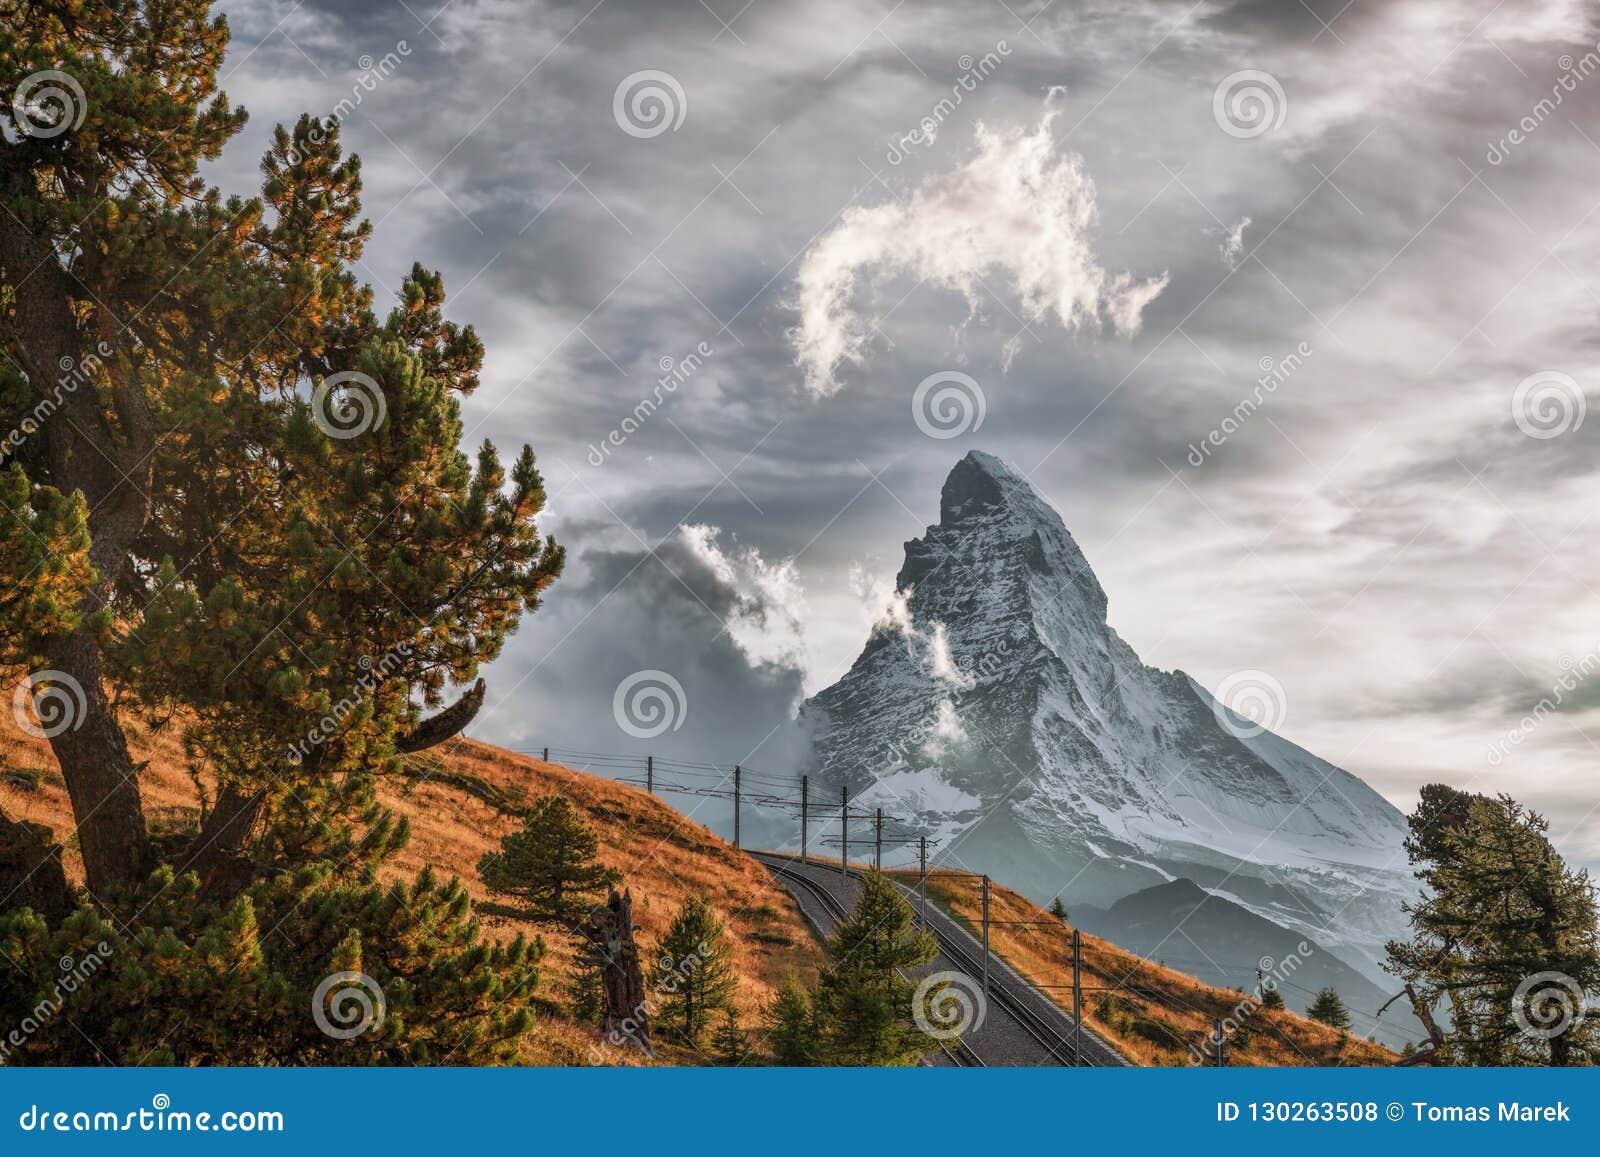 Matterhorn peak with railway with sunset in Swiss Alps, Switzerland